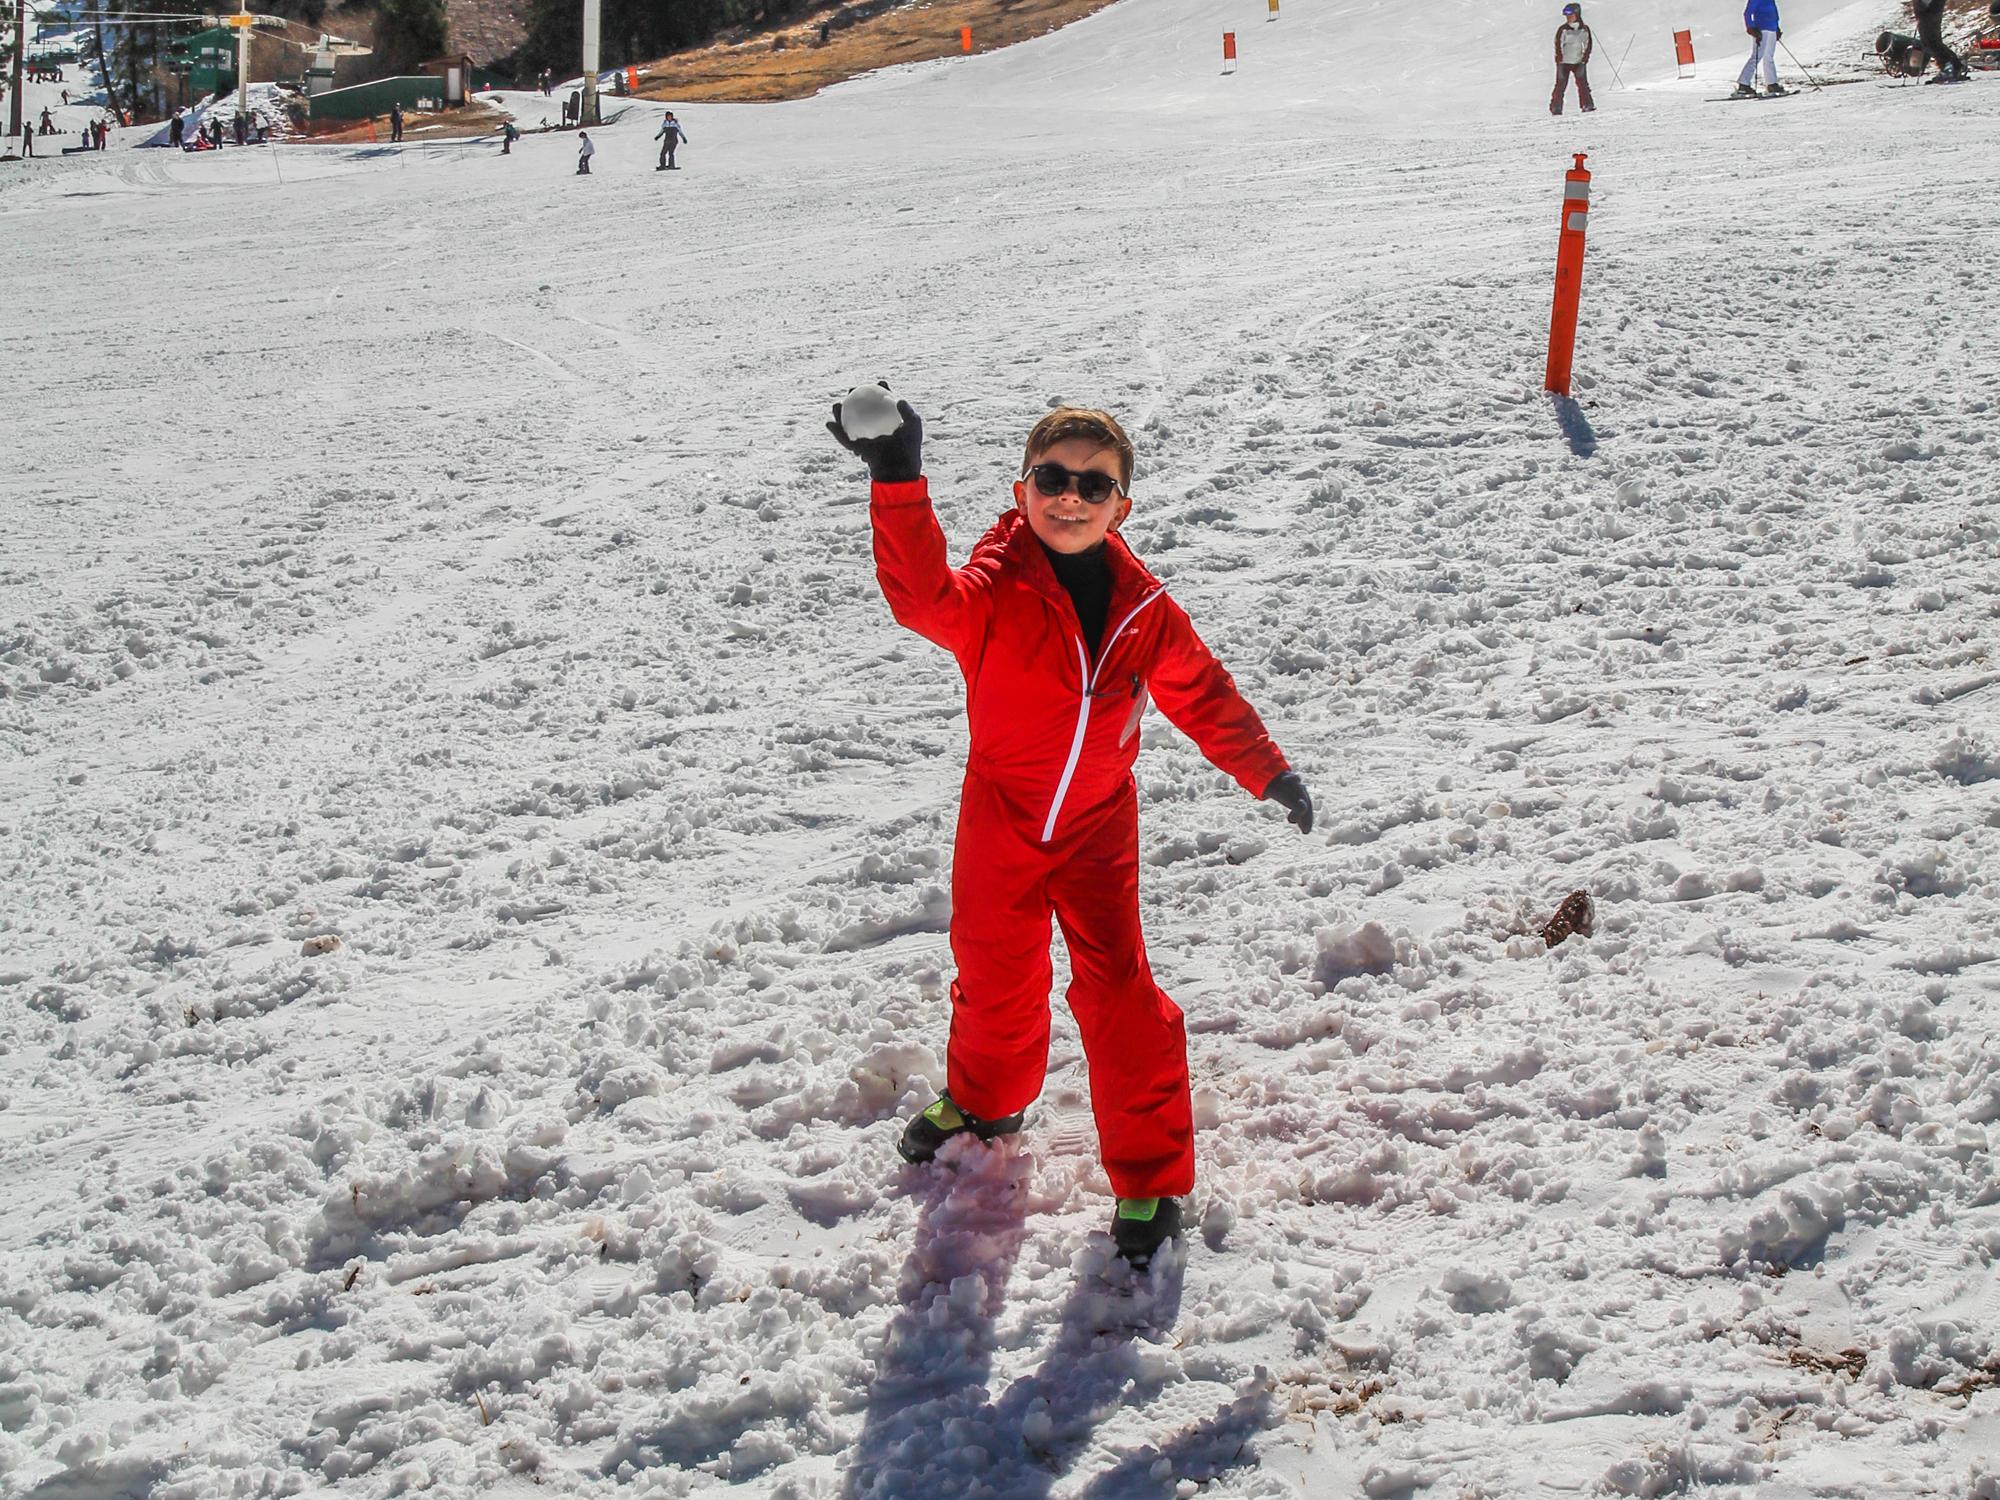 Big_bear_lake_snow_summit_Los angeles.JPG